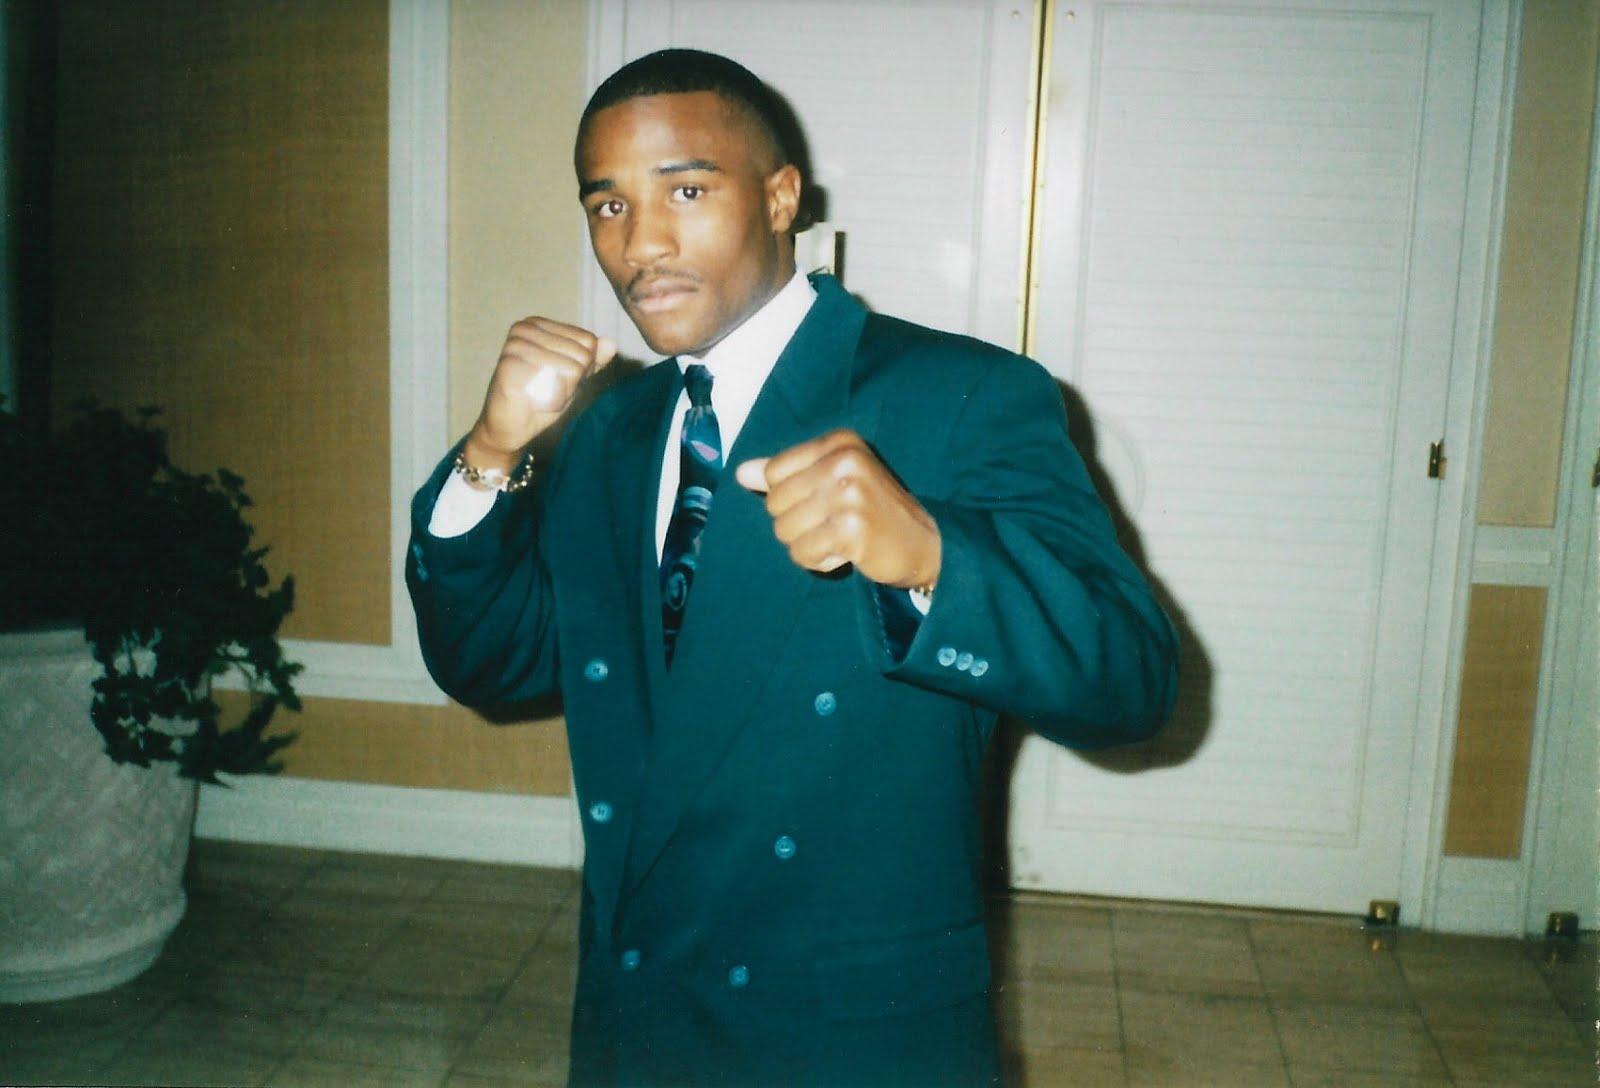 Detroit Welterweight Oba Carr